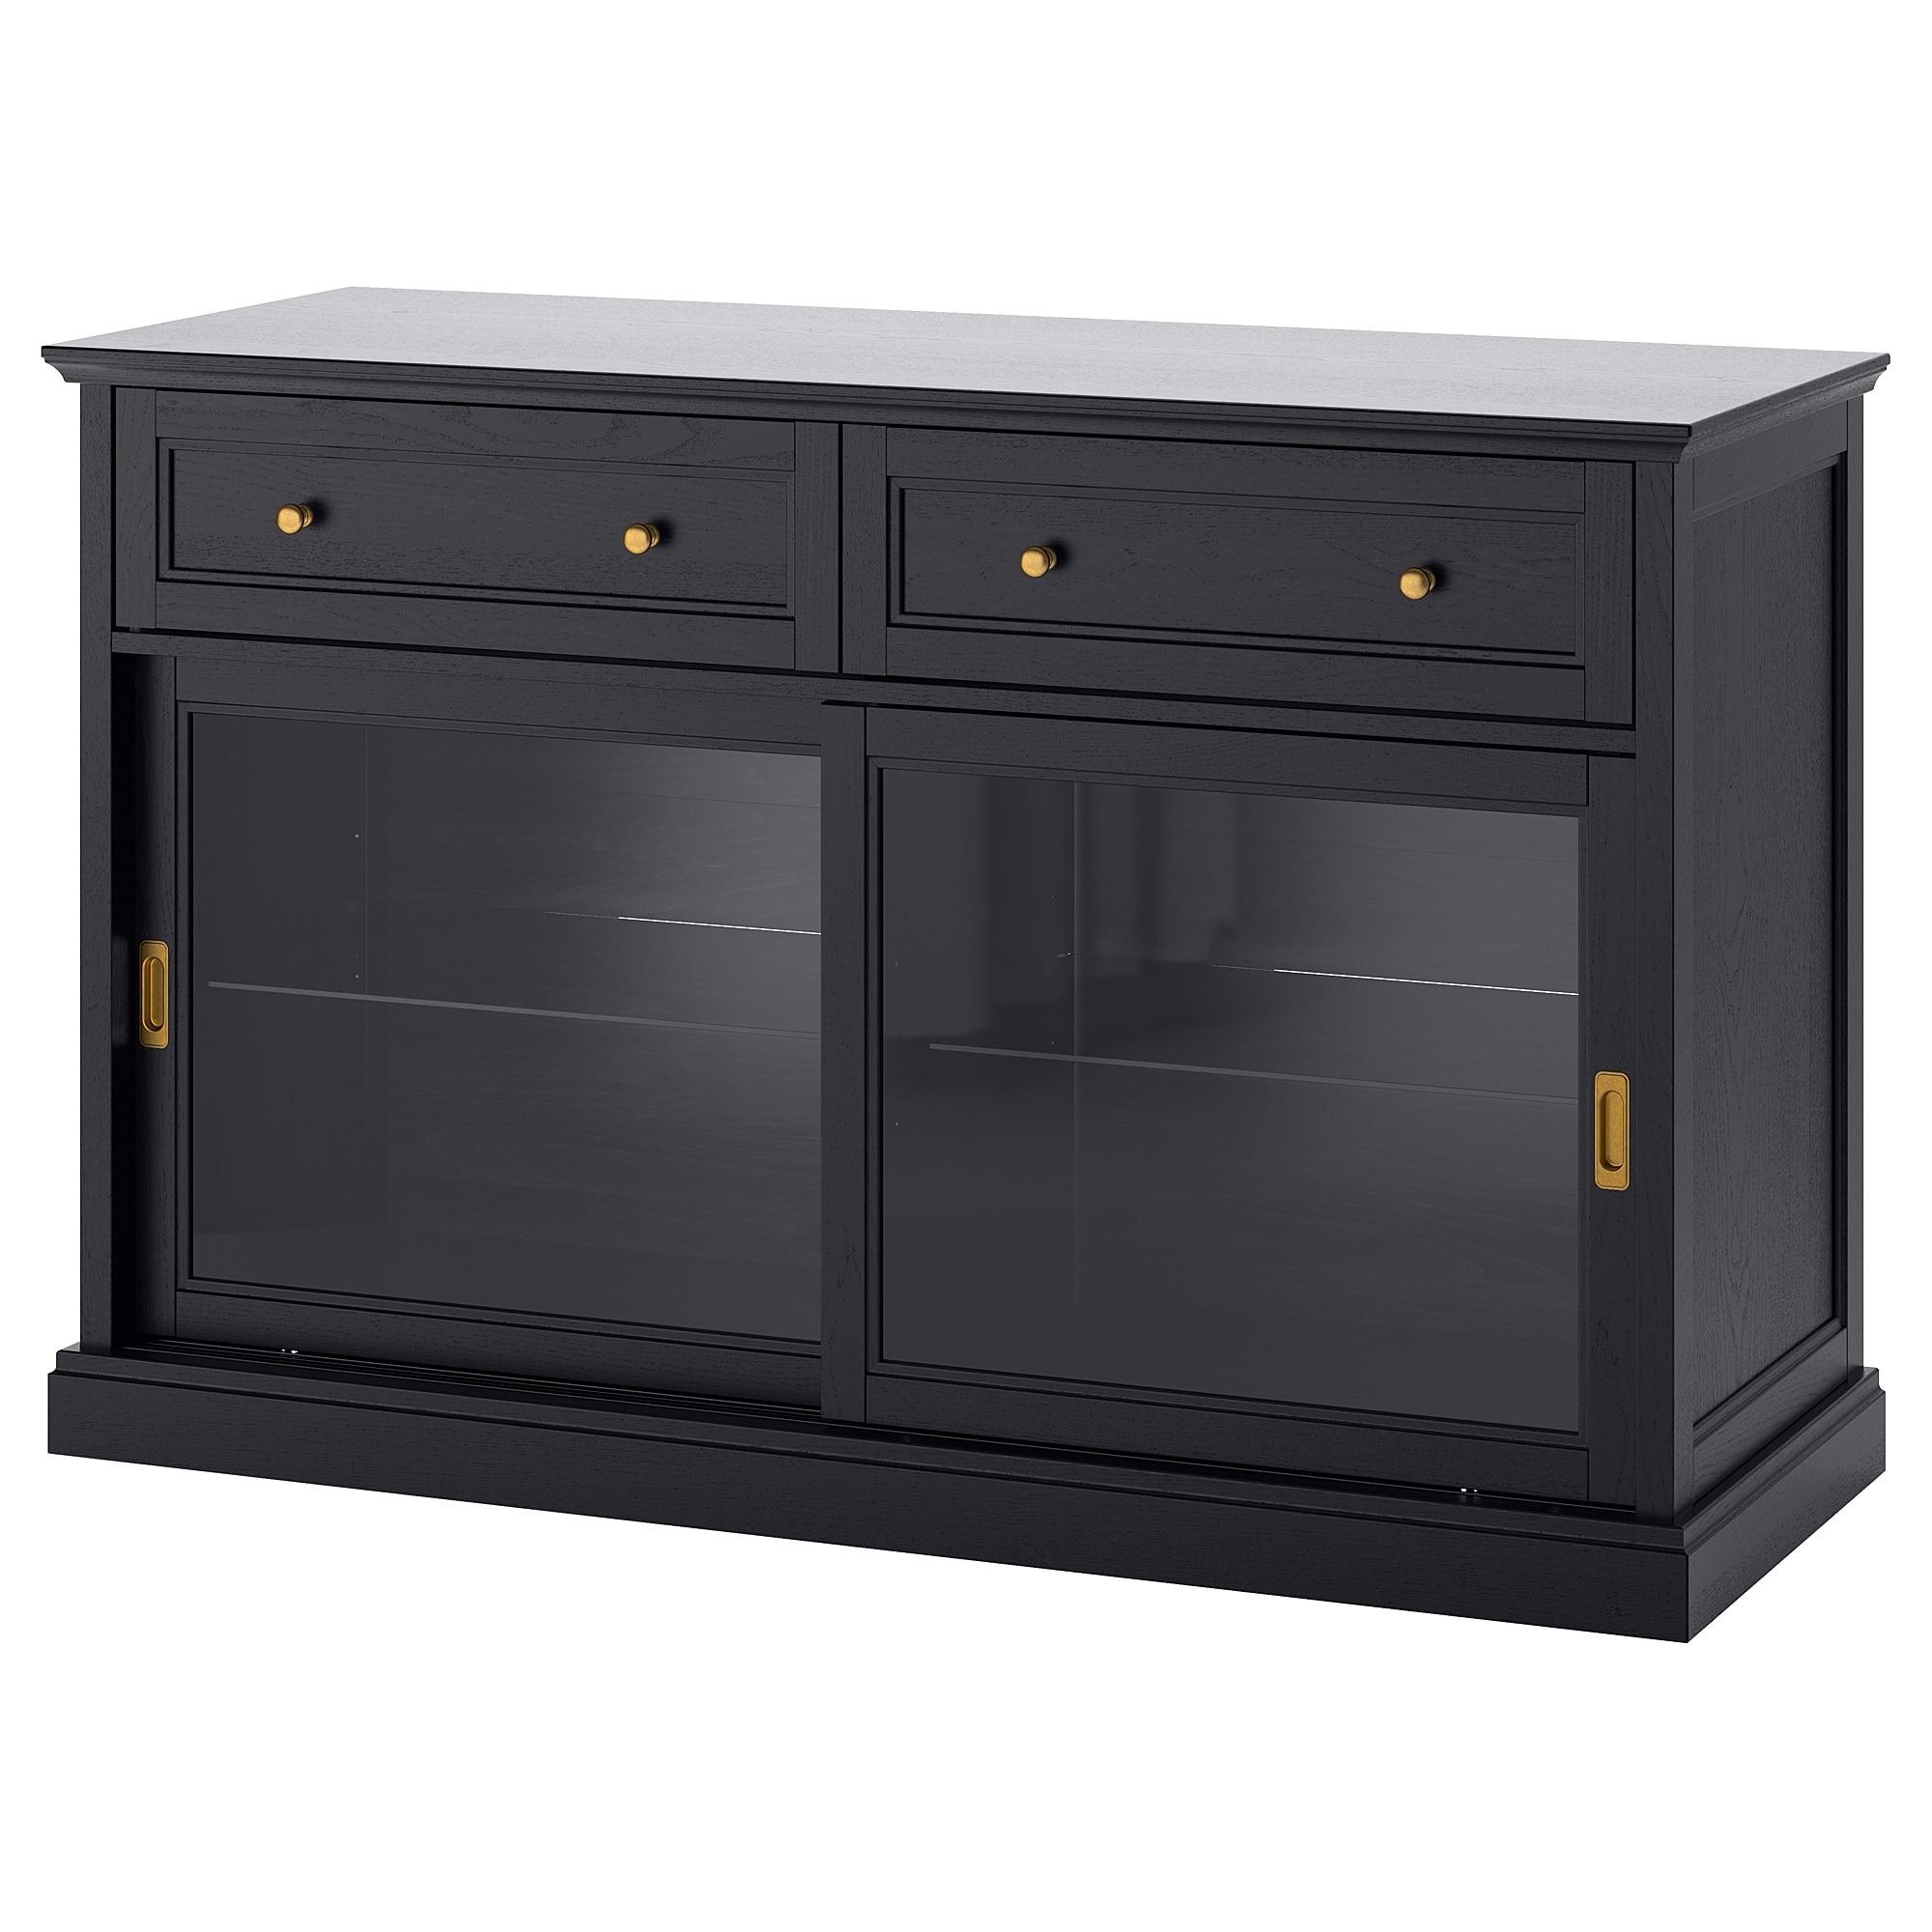 Sideboards & Buffet Cabinets | Ikea in Brown Chevron 4-Door Sideboards (Image 28 of 30)